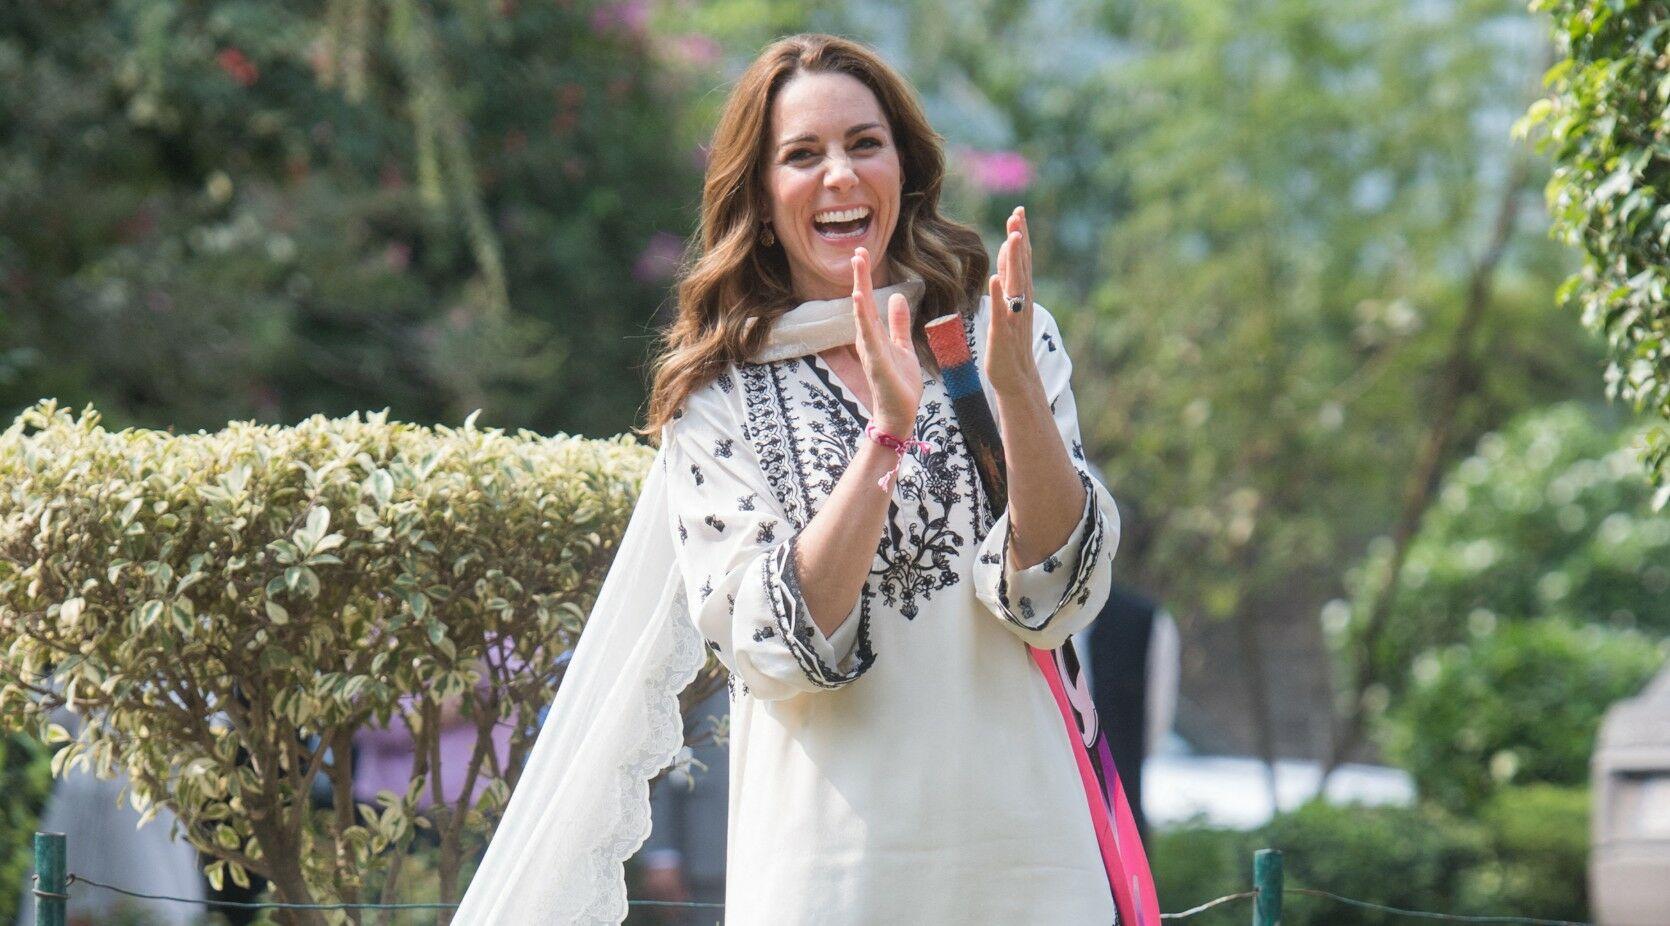 Kate Middleton au Pakistan : découvrez le coût exorbitant de sa garde-robe!